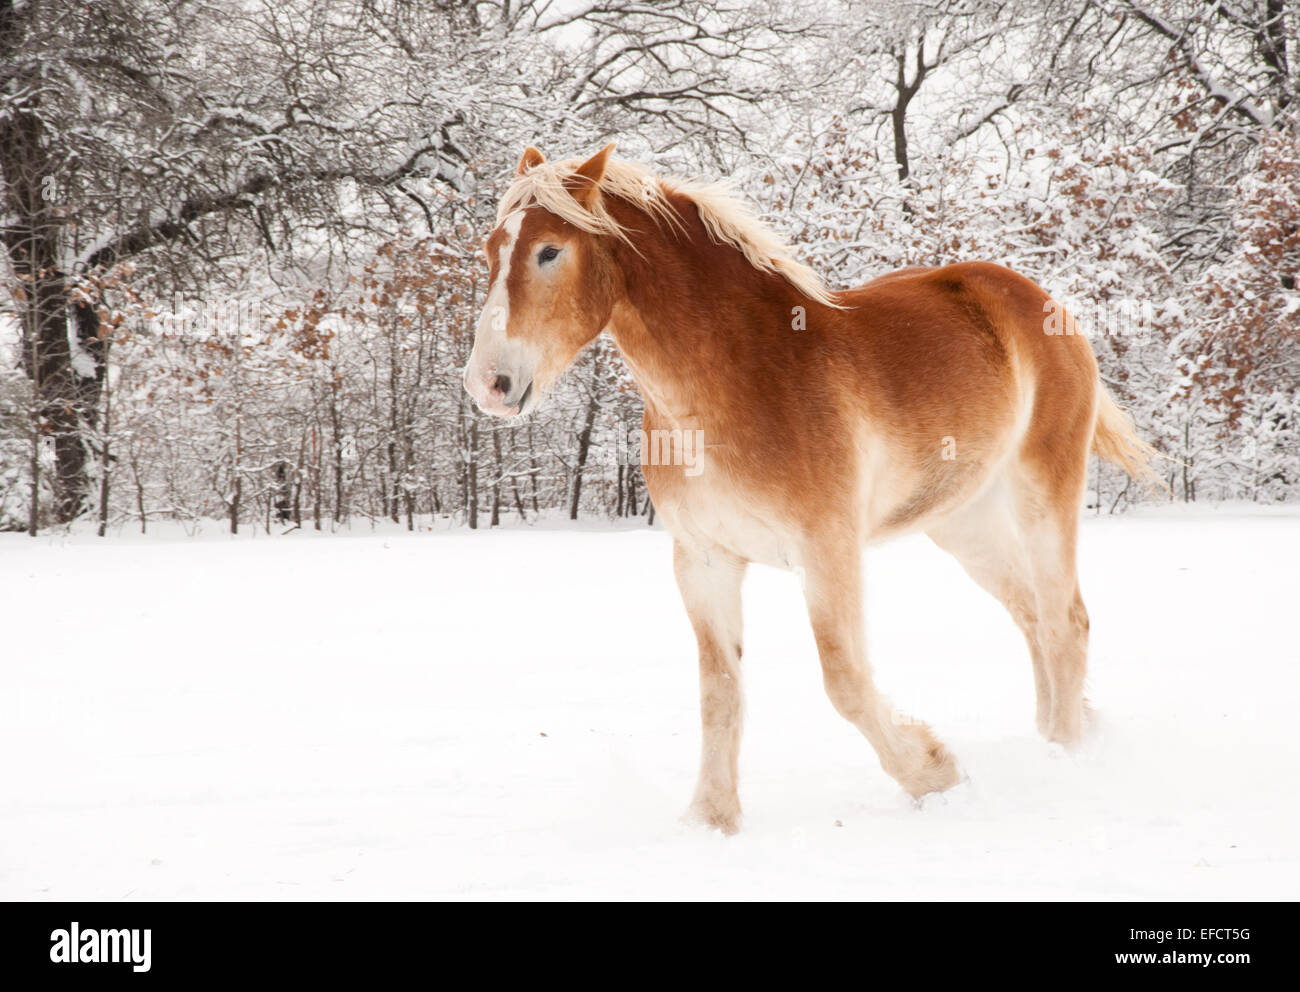 Belgian Draft horse in snow - Stock Image